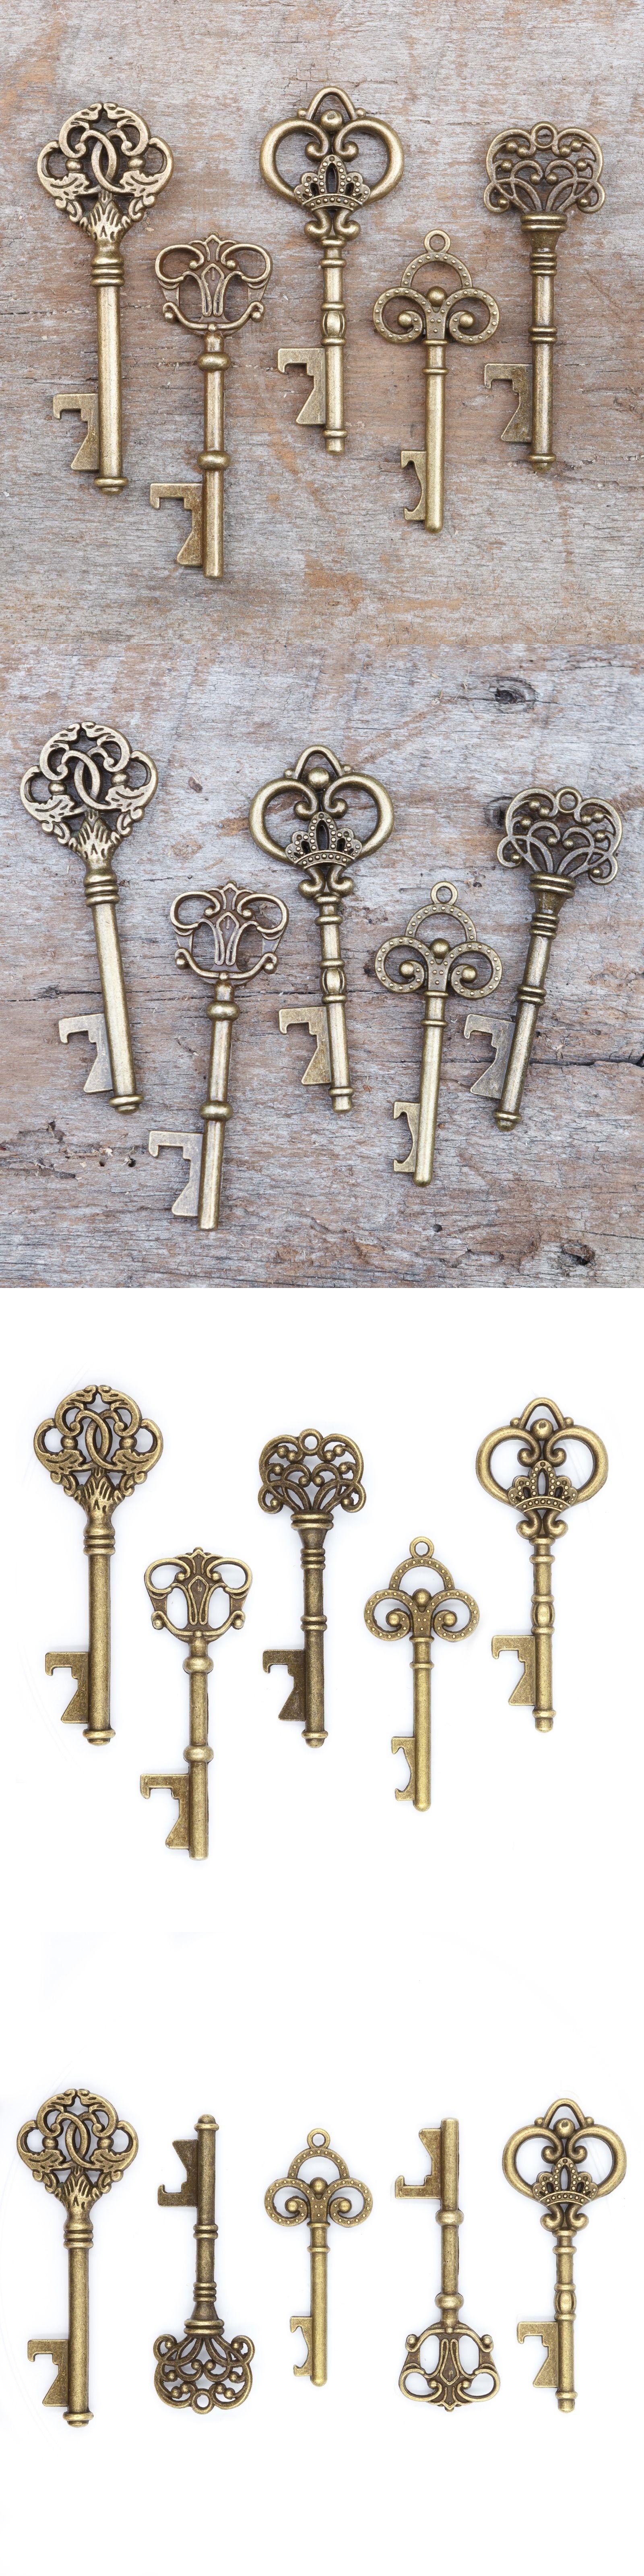 Wedding Favors 33156: 50 Assorted Key Bottle Openers - Vintage ...